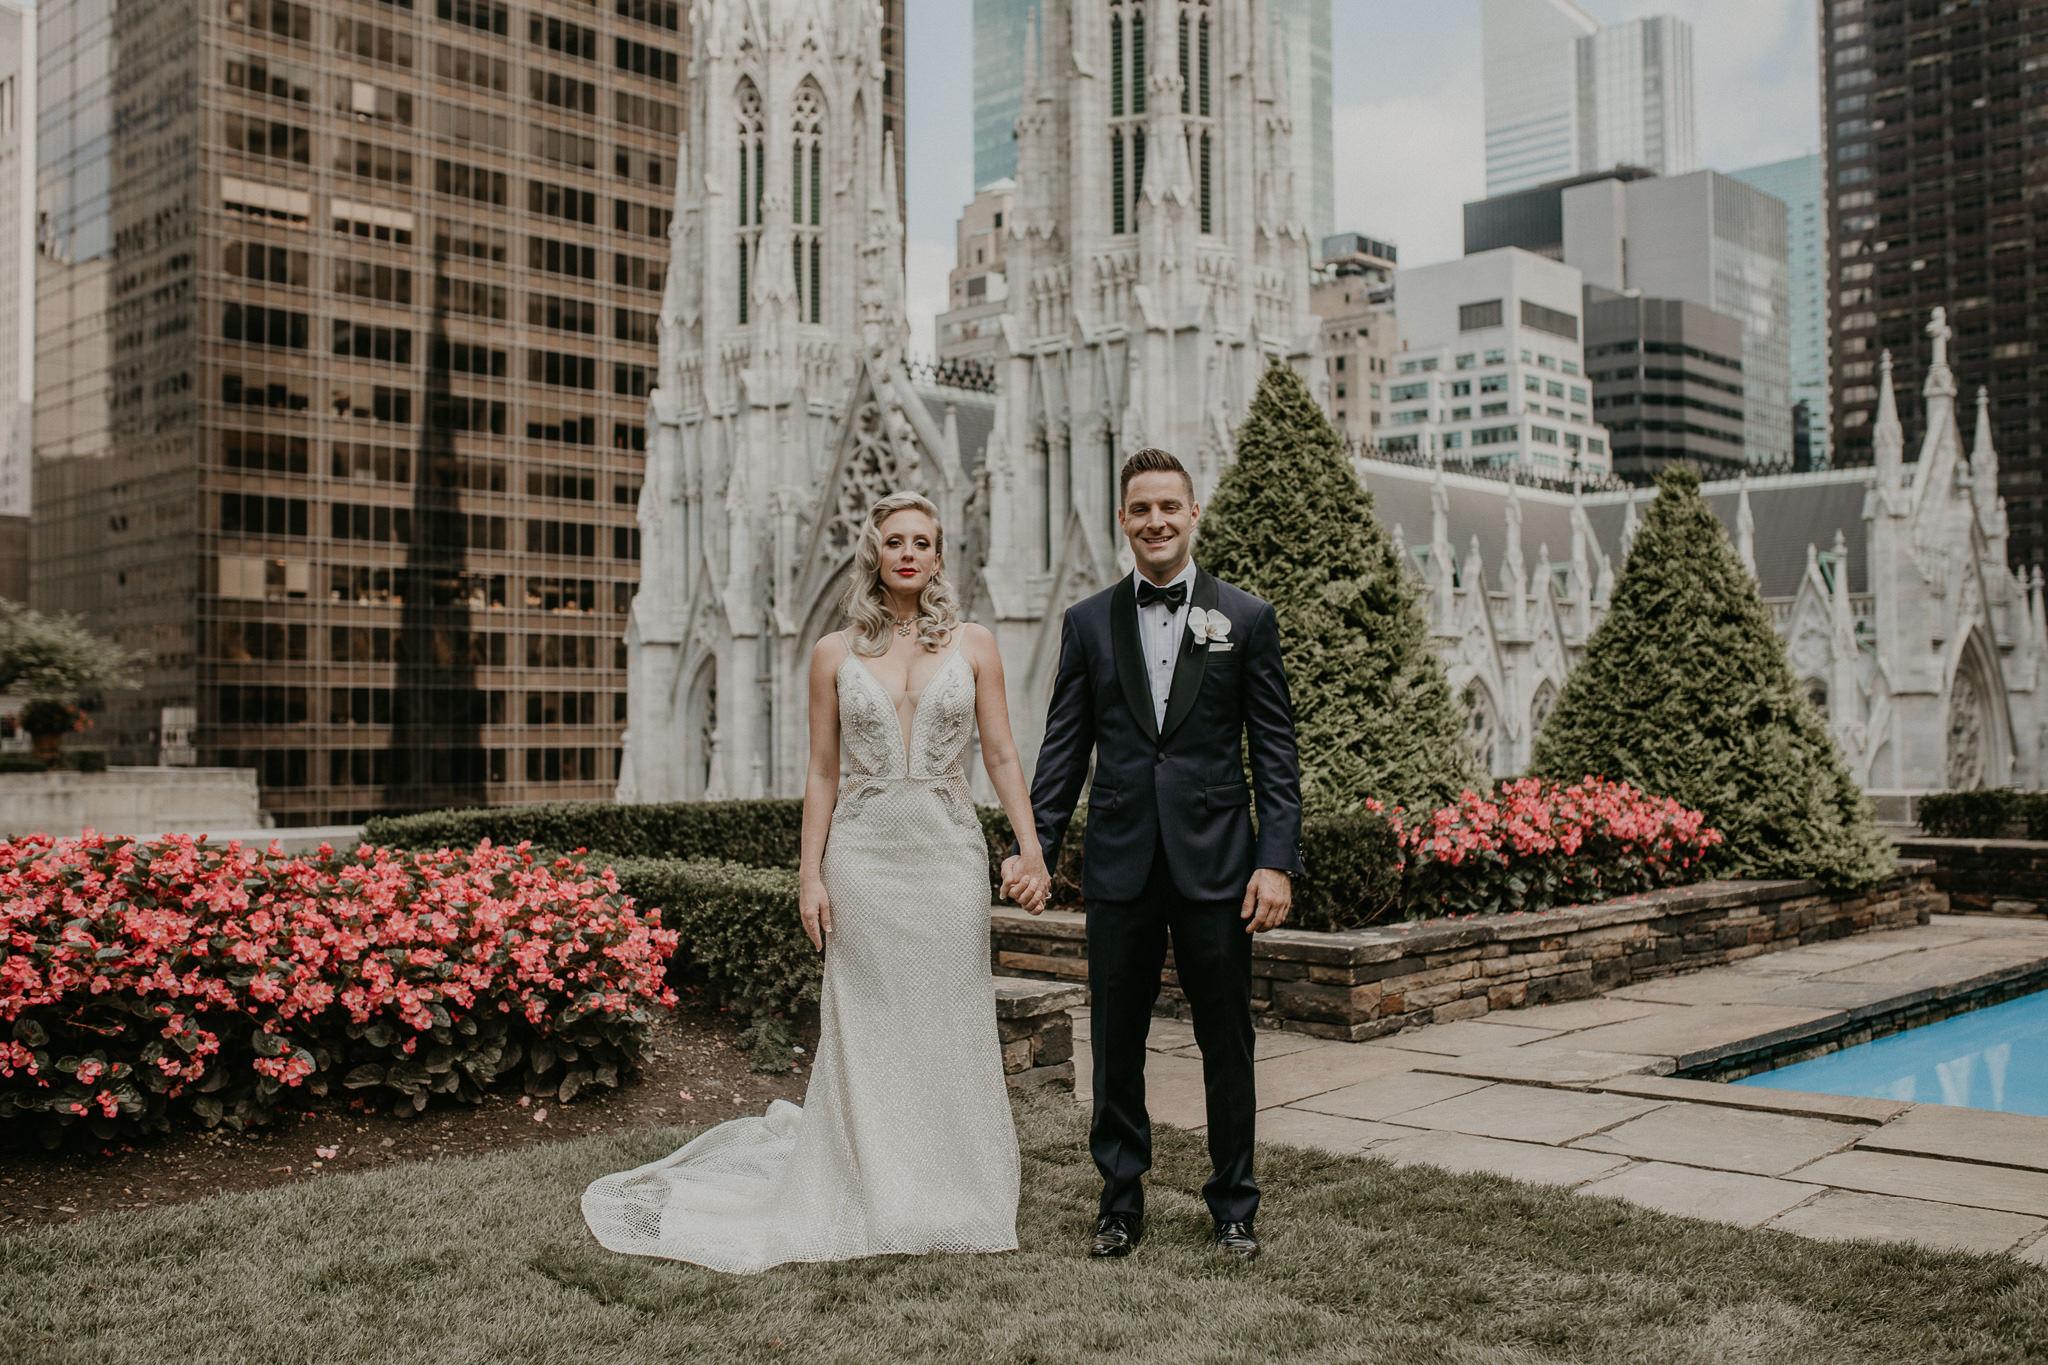 M+J_NYC_Wedding_StPatricks_30Rock_RainbowRoom_056.jpg